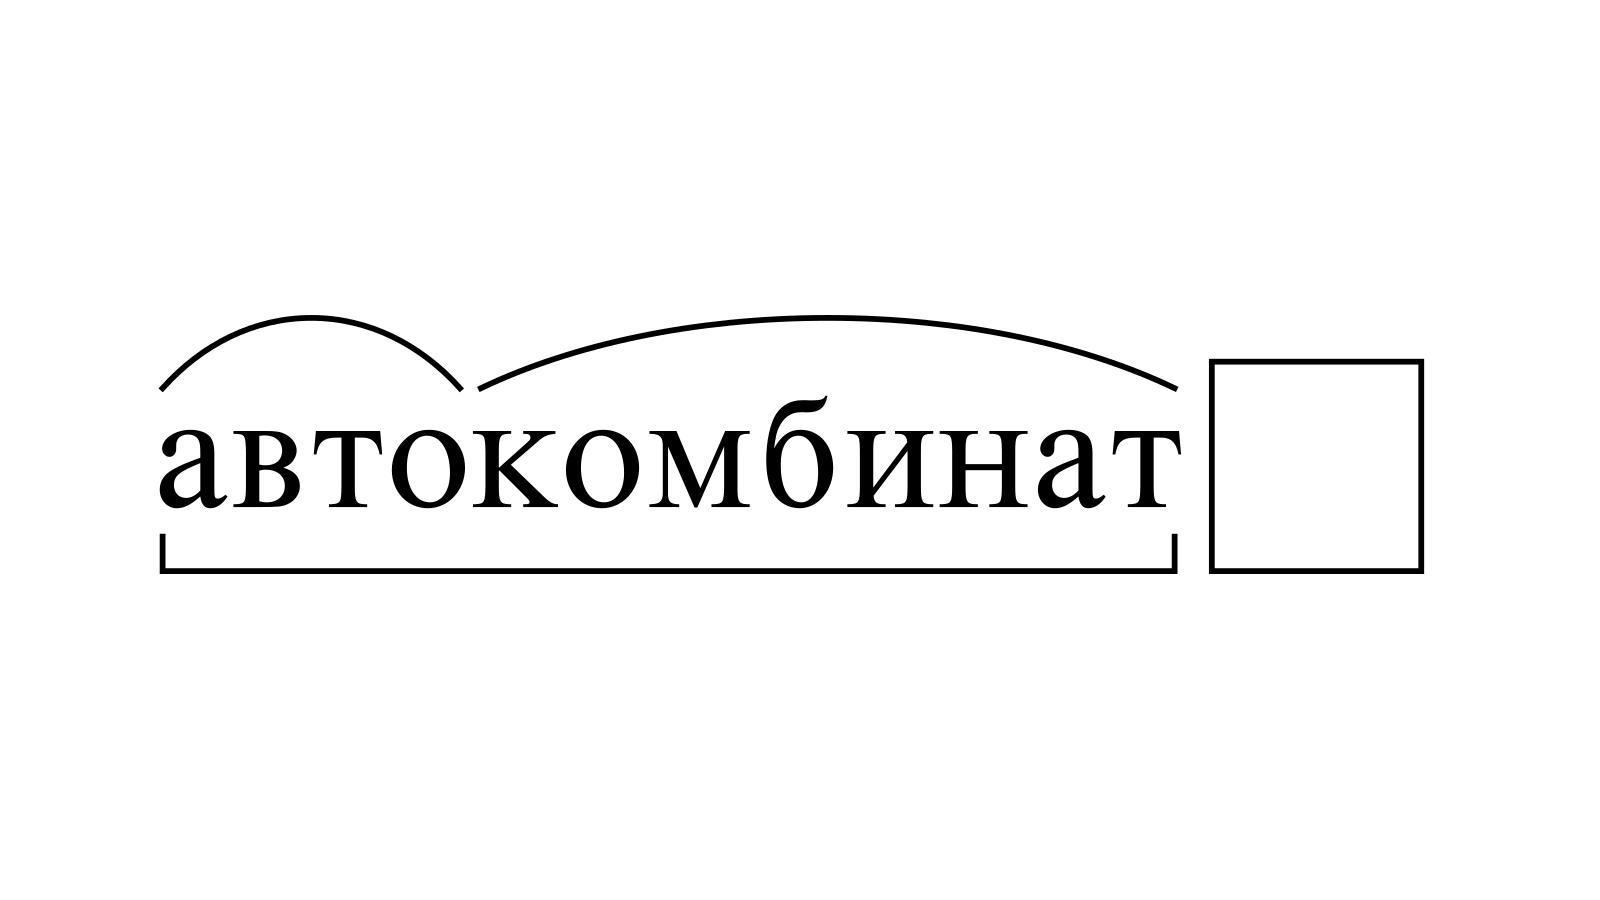 Разбор слова «автокомбинат» по составу